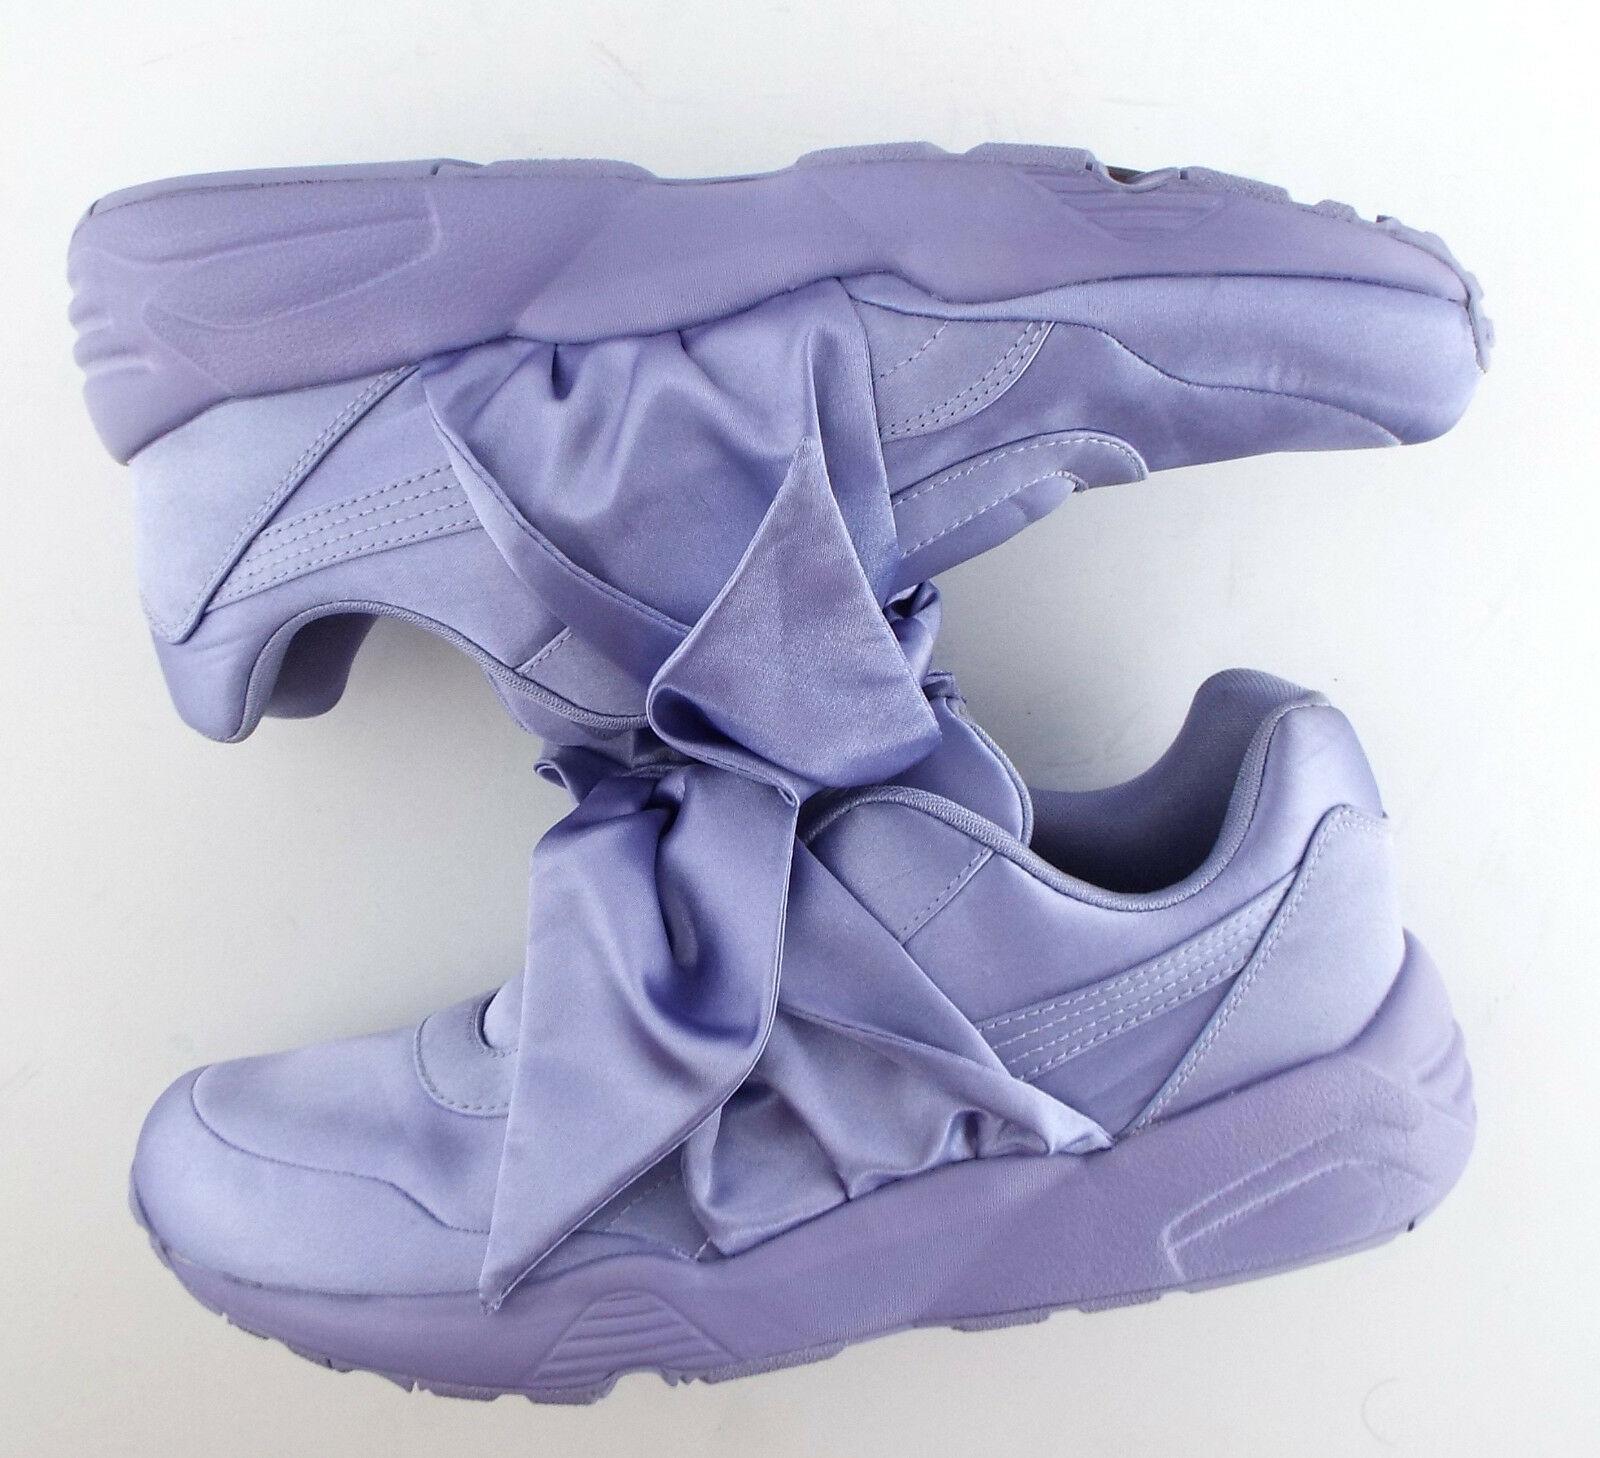 New PUMA RIHANNA Size 9 FENTY Purple Satin Bow Sneakers Shoes image 7